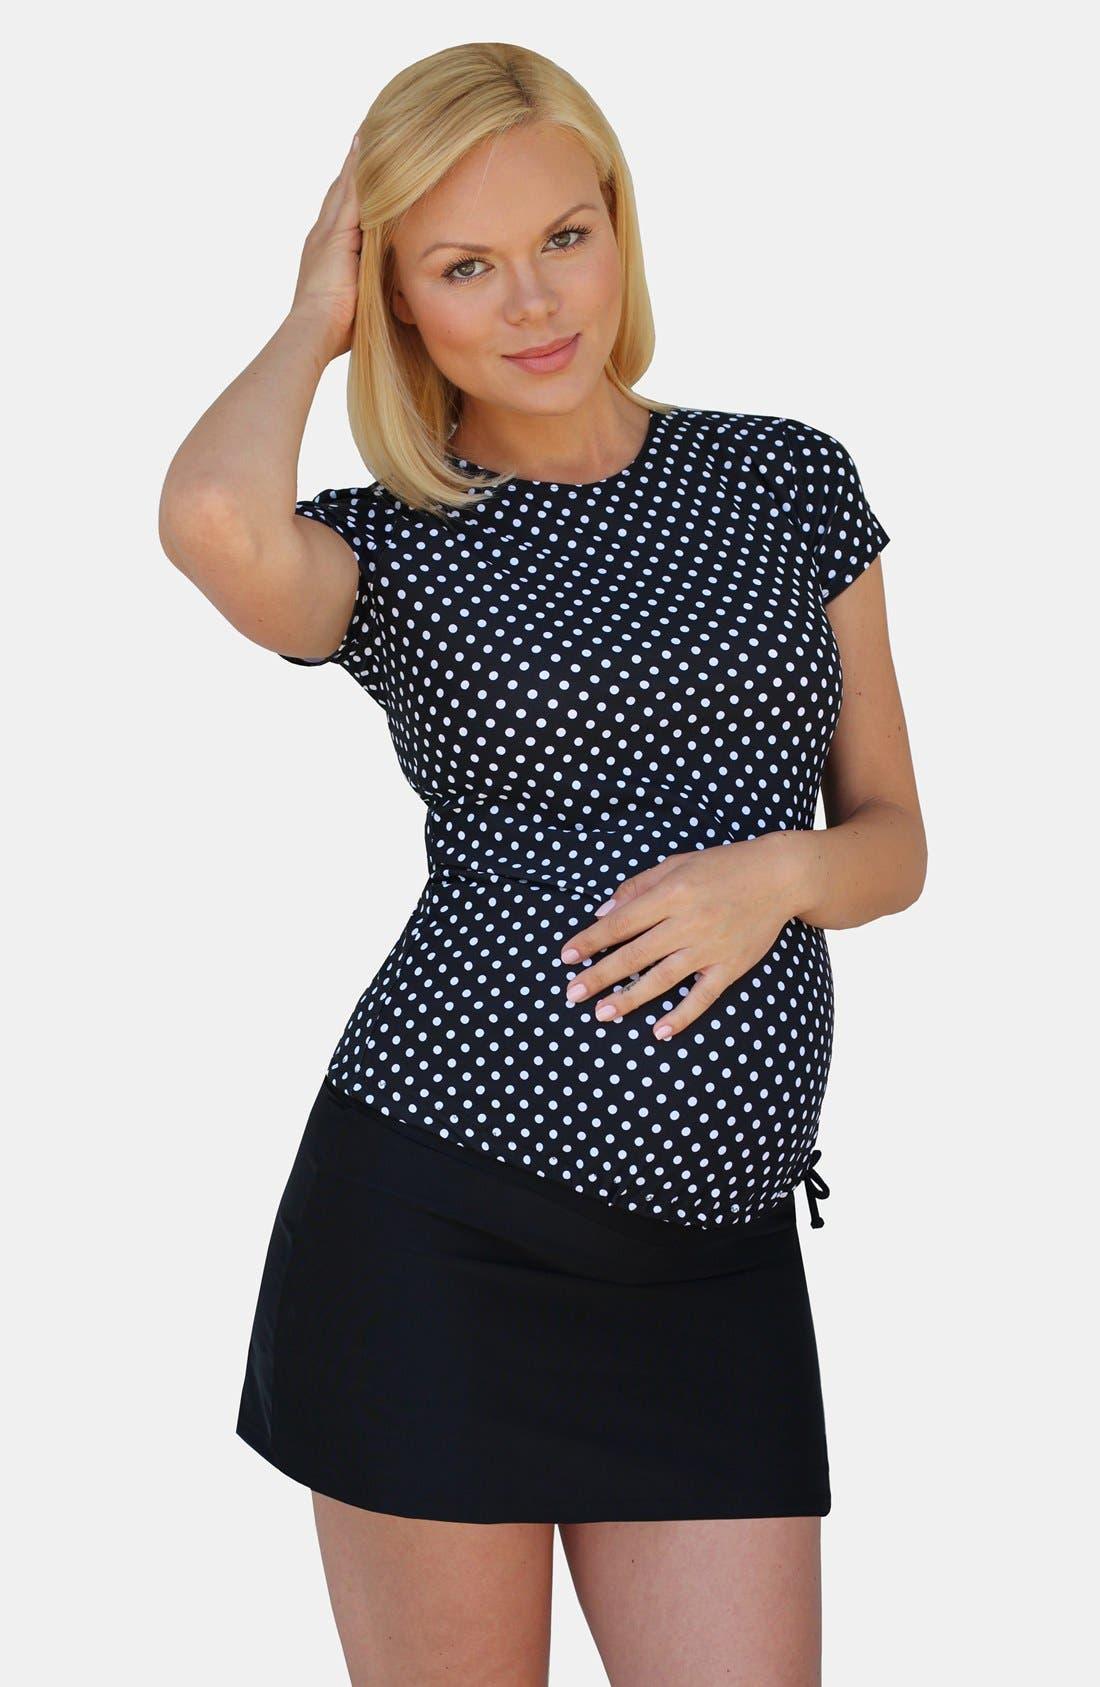 Short Sleeve Rashguard Swim Shirt,                         Main,                         color, Black/ White Polka Dots